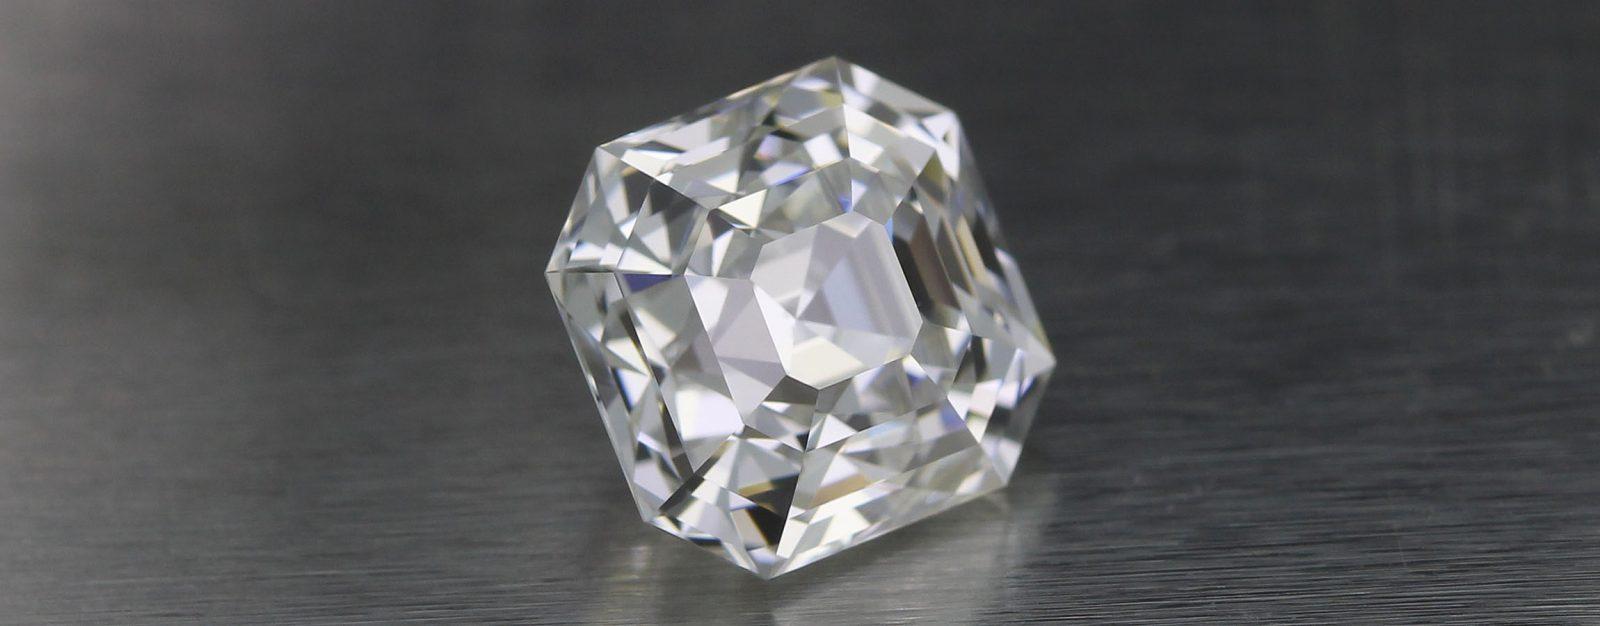 1.22 carat Octavia Diamond